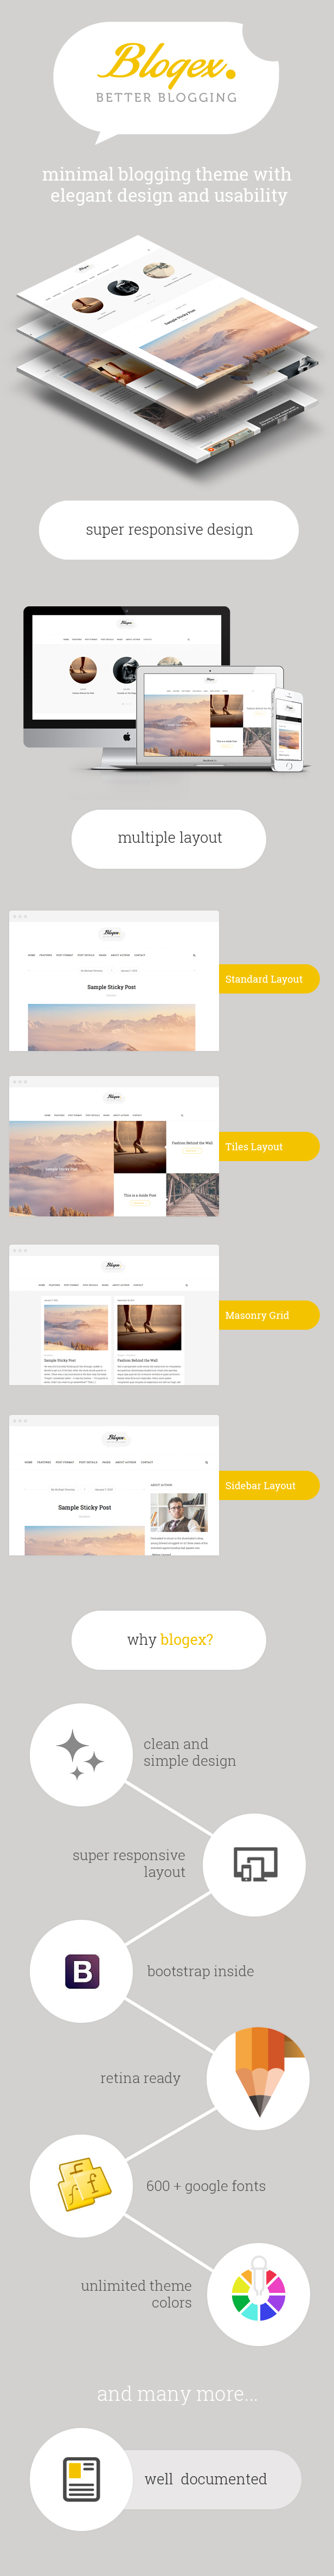 Blogex - Minimal HTML Responsive Blog Theme - 2